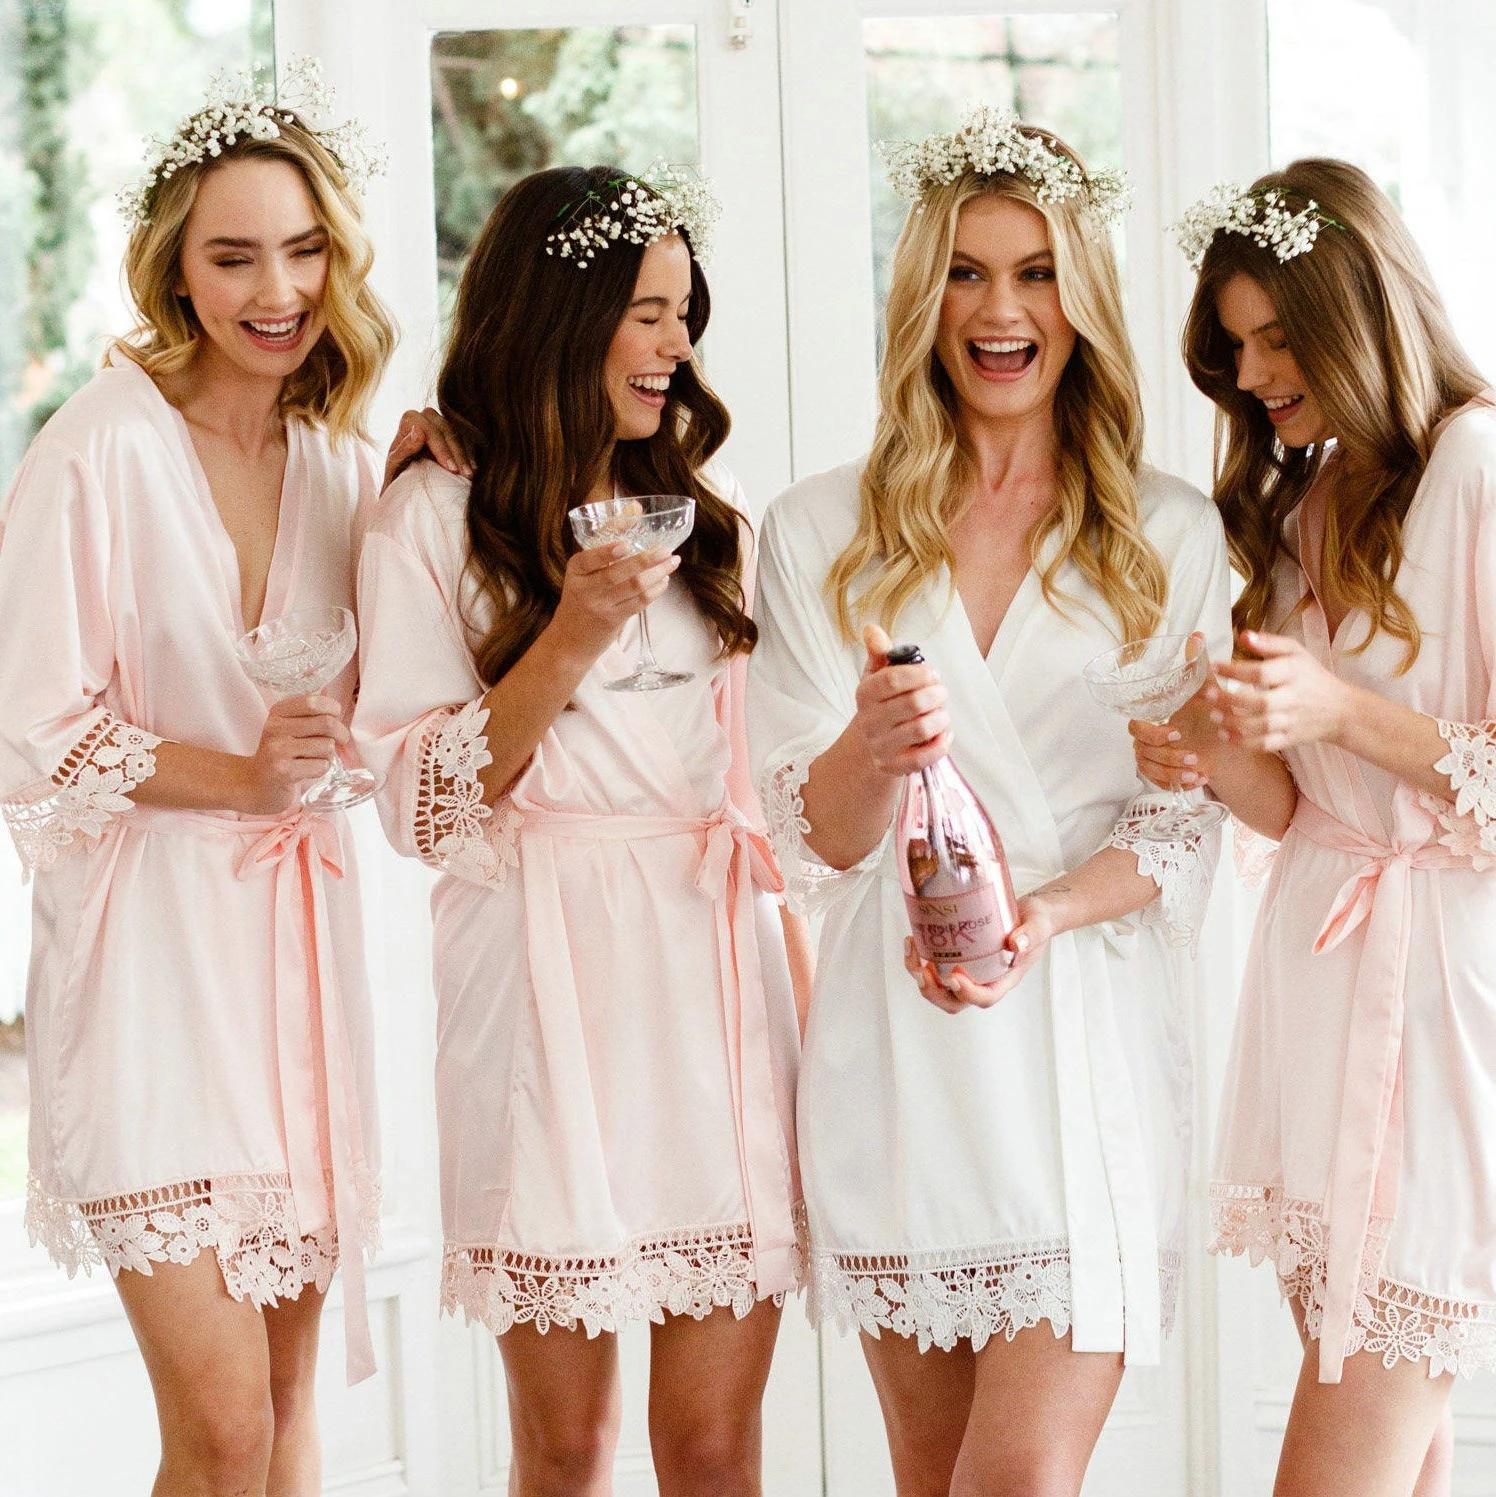 2020 Women Matt Satin Lace Robe Bride Robe Bridesmaid Robes Bridal Wedding Robe Bathrobe Sleepwear Dressing White Robes Robes Aliexpress